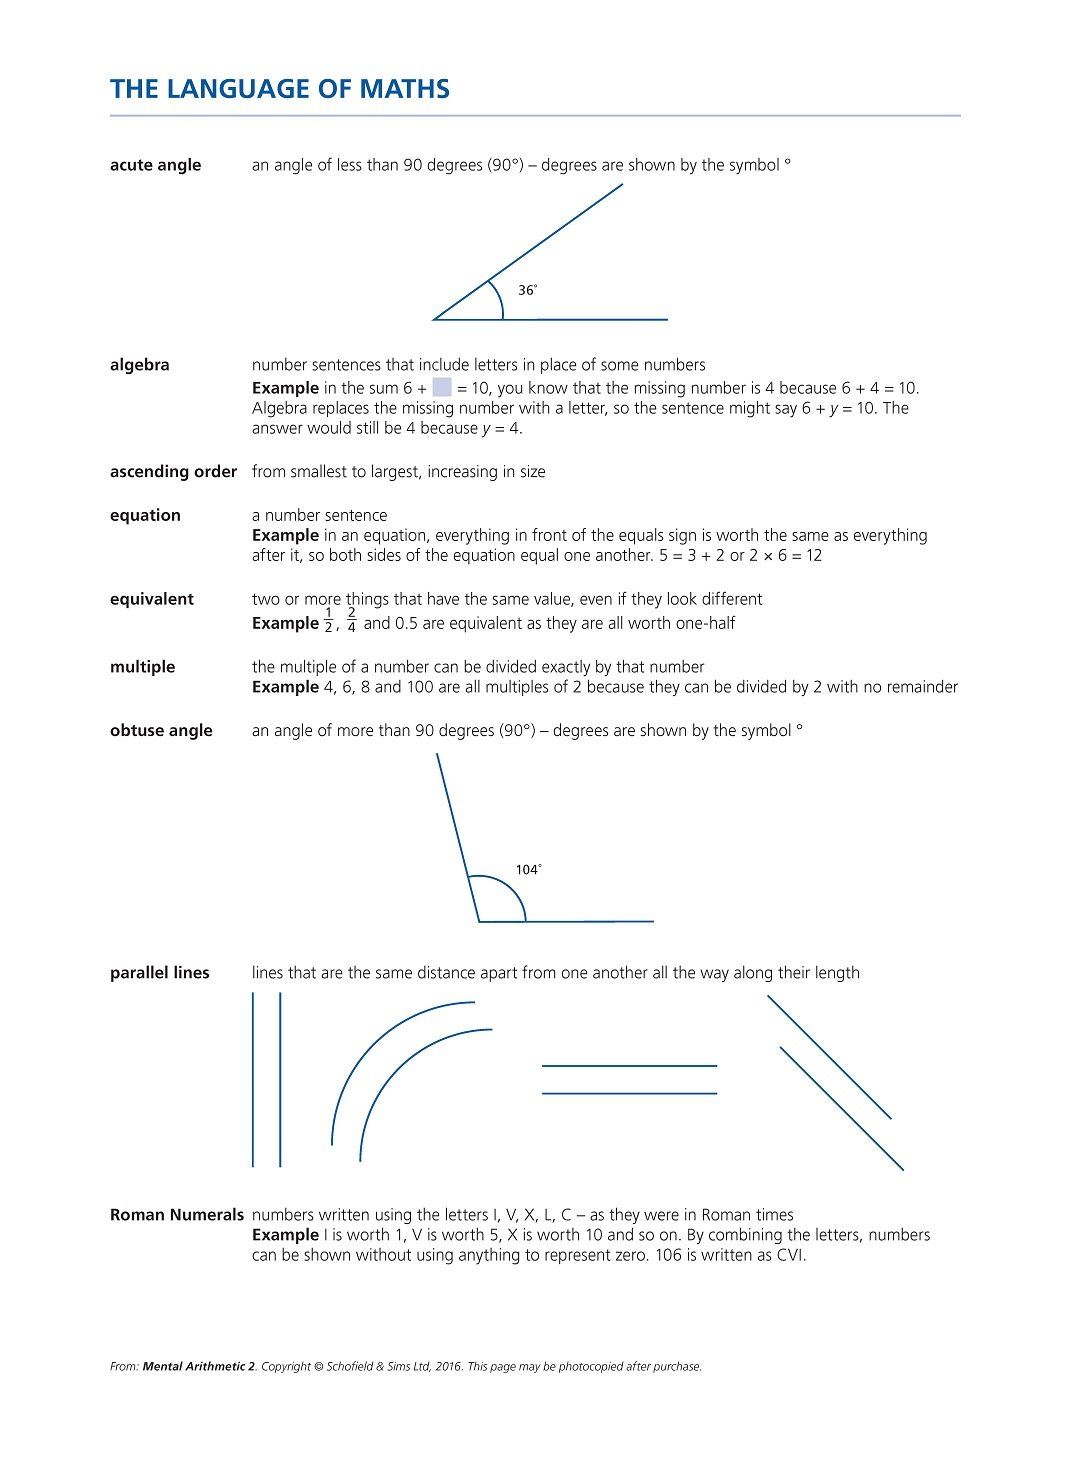 Mental Arithmetic Book 2 Bk 2 R Goddard T 9780721708003 Amazon